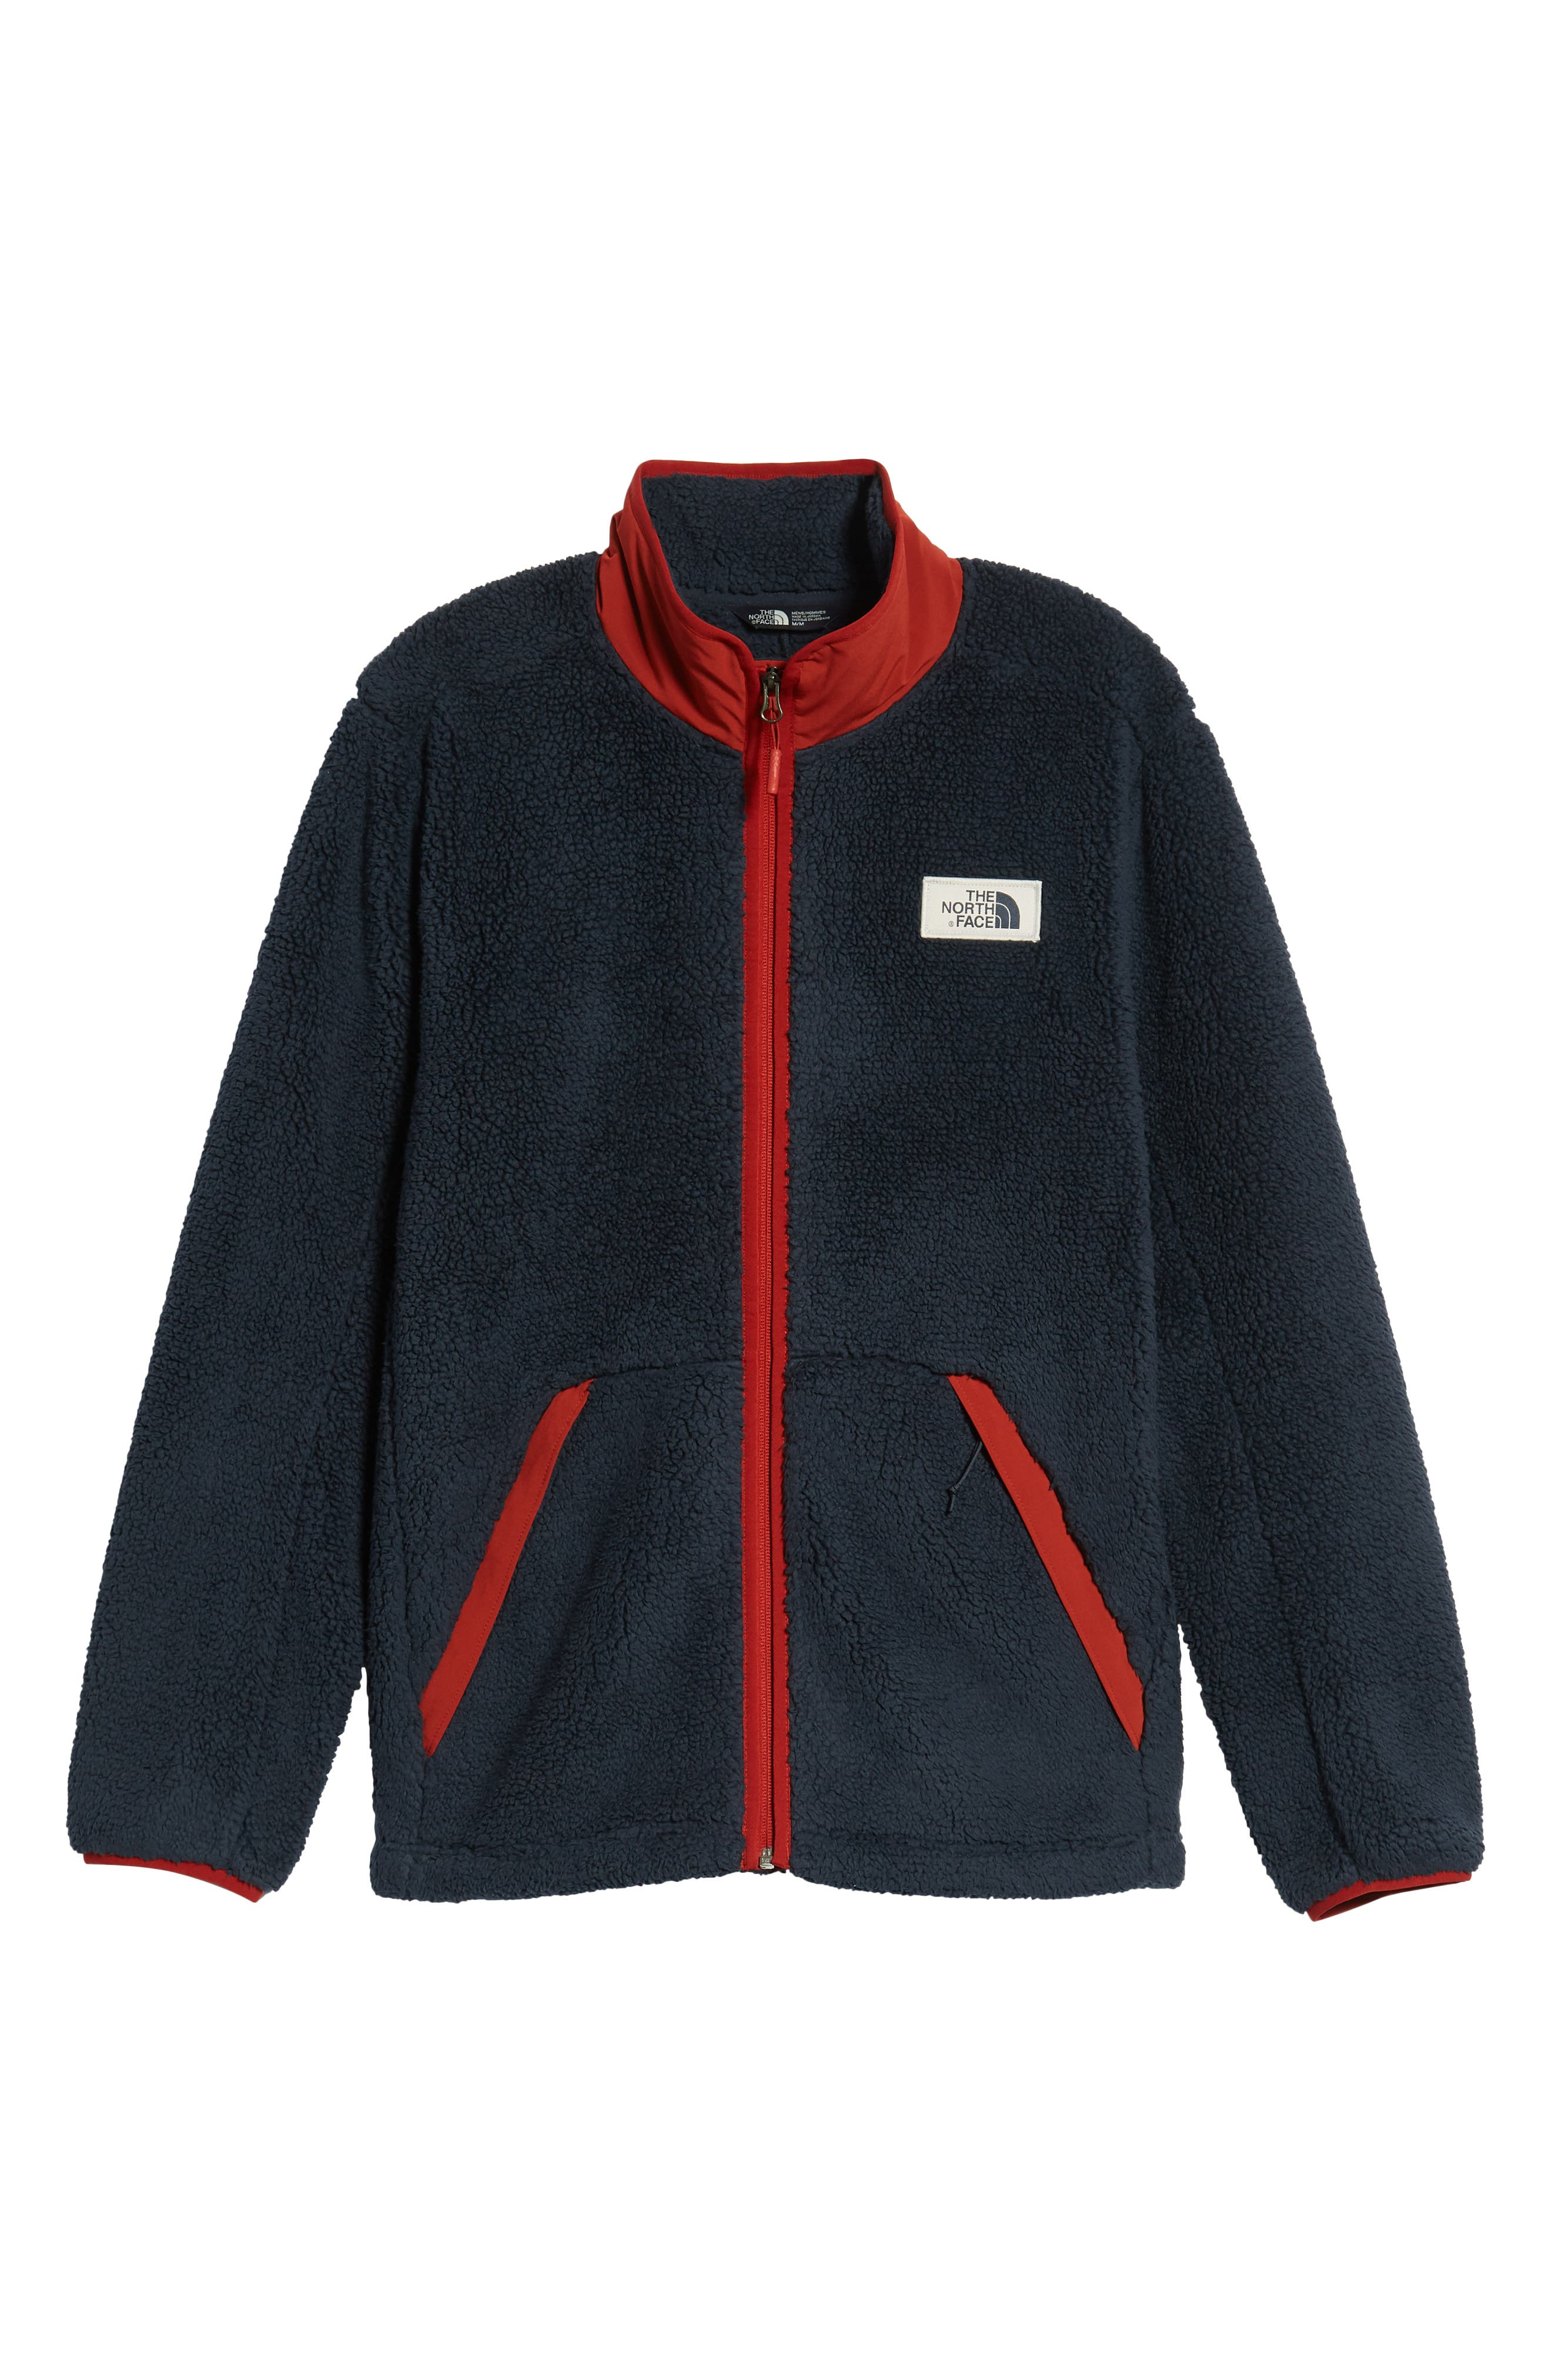 Campshire Zip Fleece Jacket,                             Alternate thumbnail 60, color,